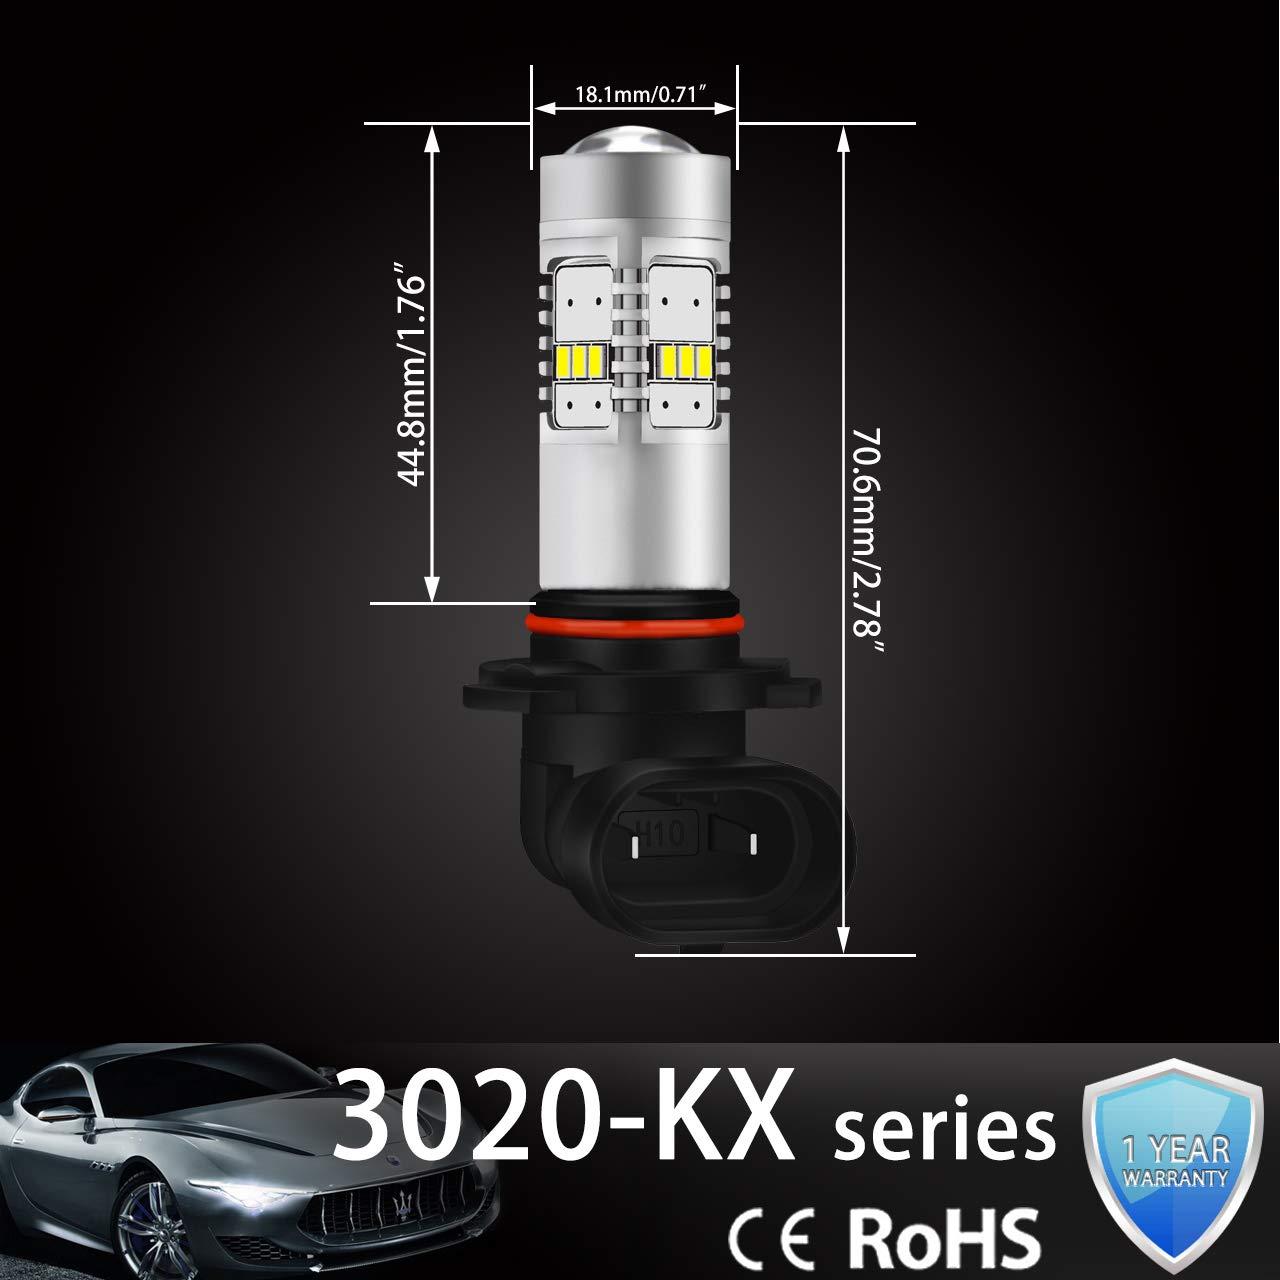 NGCAT 1800 Lumens 14 SMD 3020 CREE 9005 HB3 LED Bulbs for Fog Lights DRL Turn Signals Light Bulbs Back Up Reverse Lights,DC 10-16V Xenon White 2-Pack